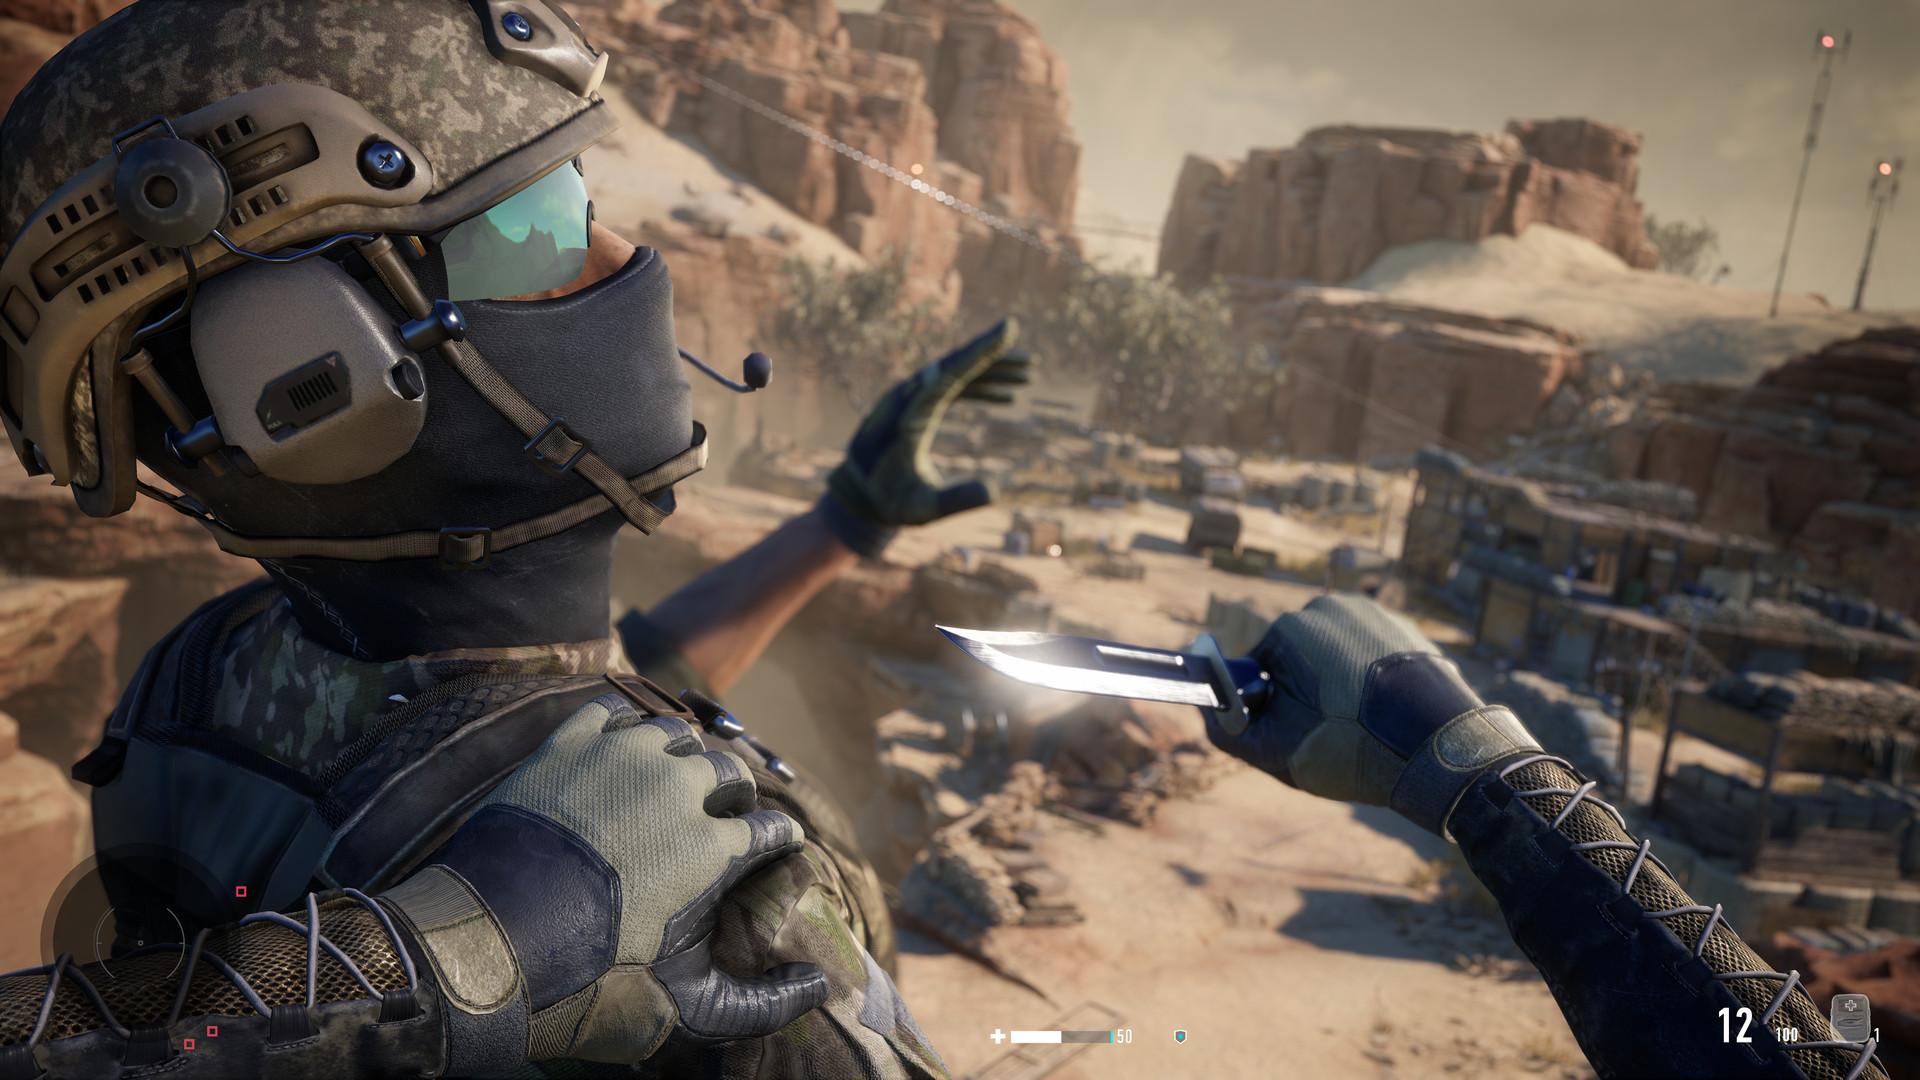 Sniper Ghost Warrior Contracts 2 na PS5. Twórcy rekompensują opóźnioną premierę